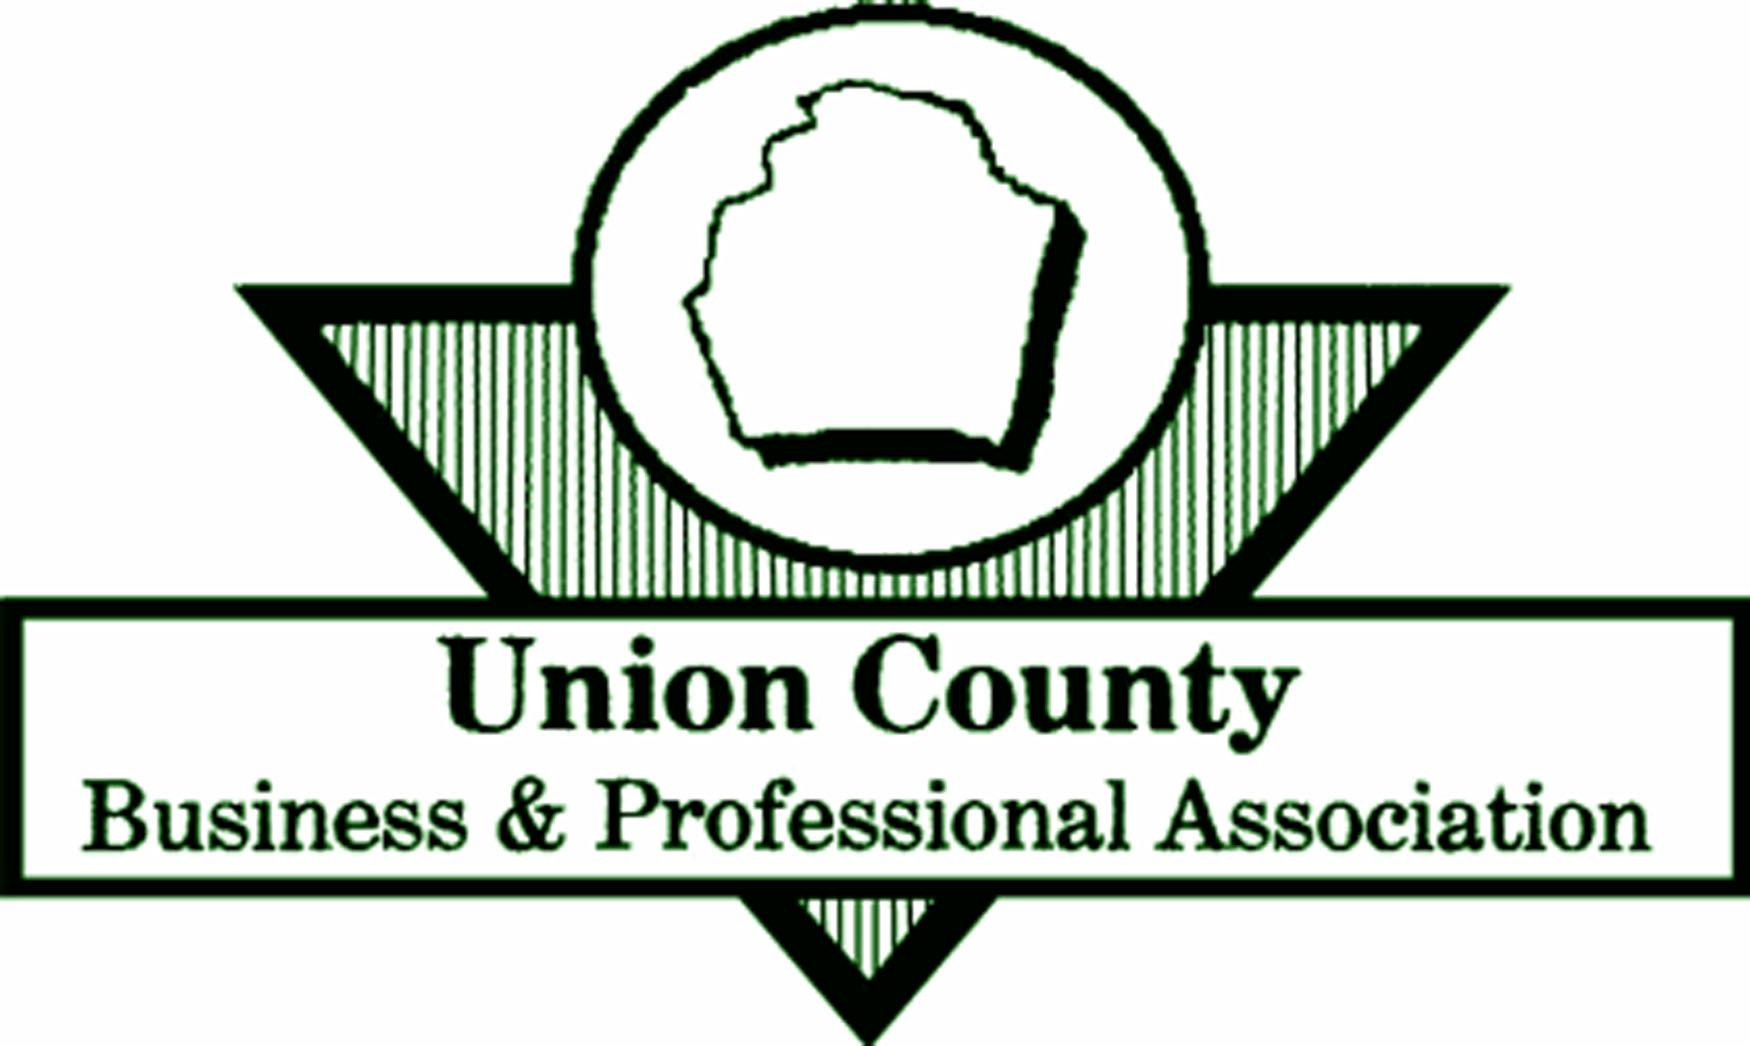 Union County Senior Citizens Center/Office on Aging  298 Main St, Maynardville, Tennessee 37807